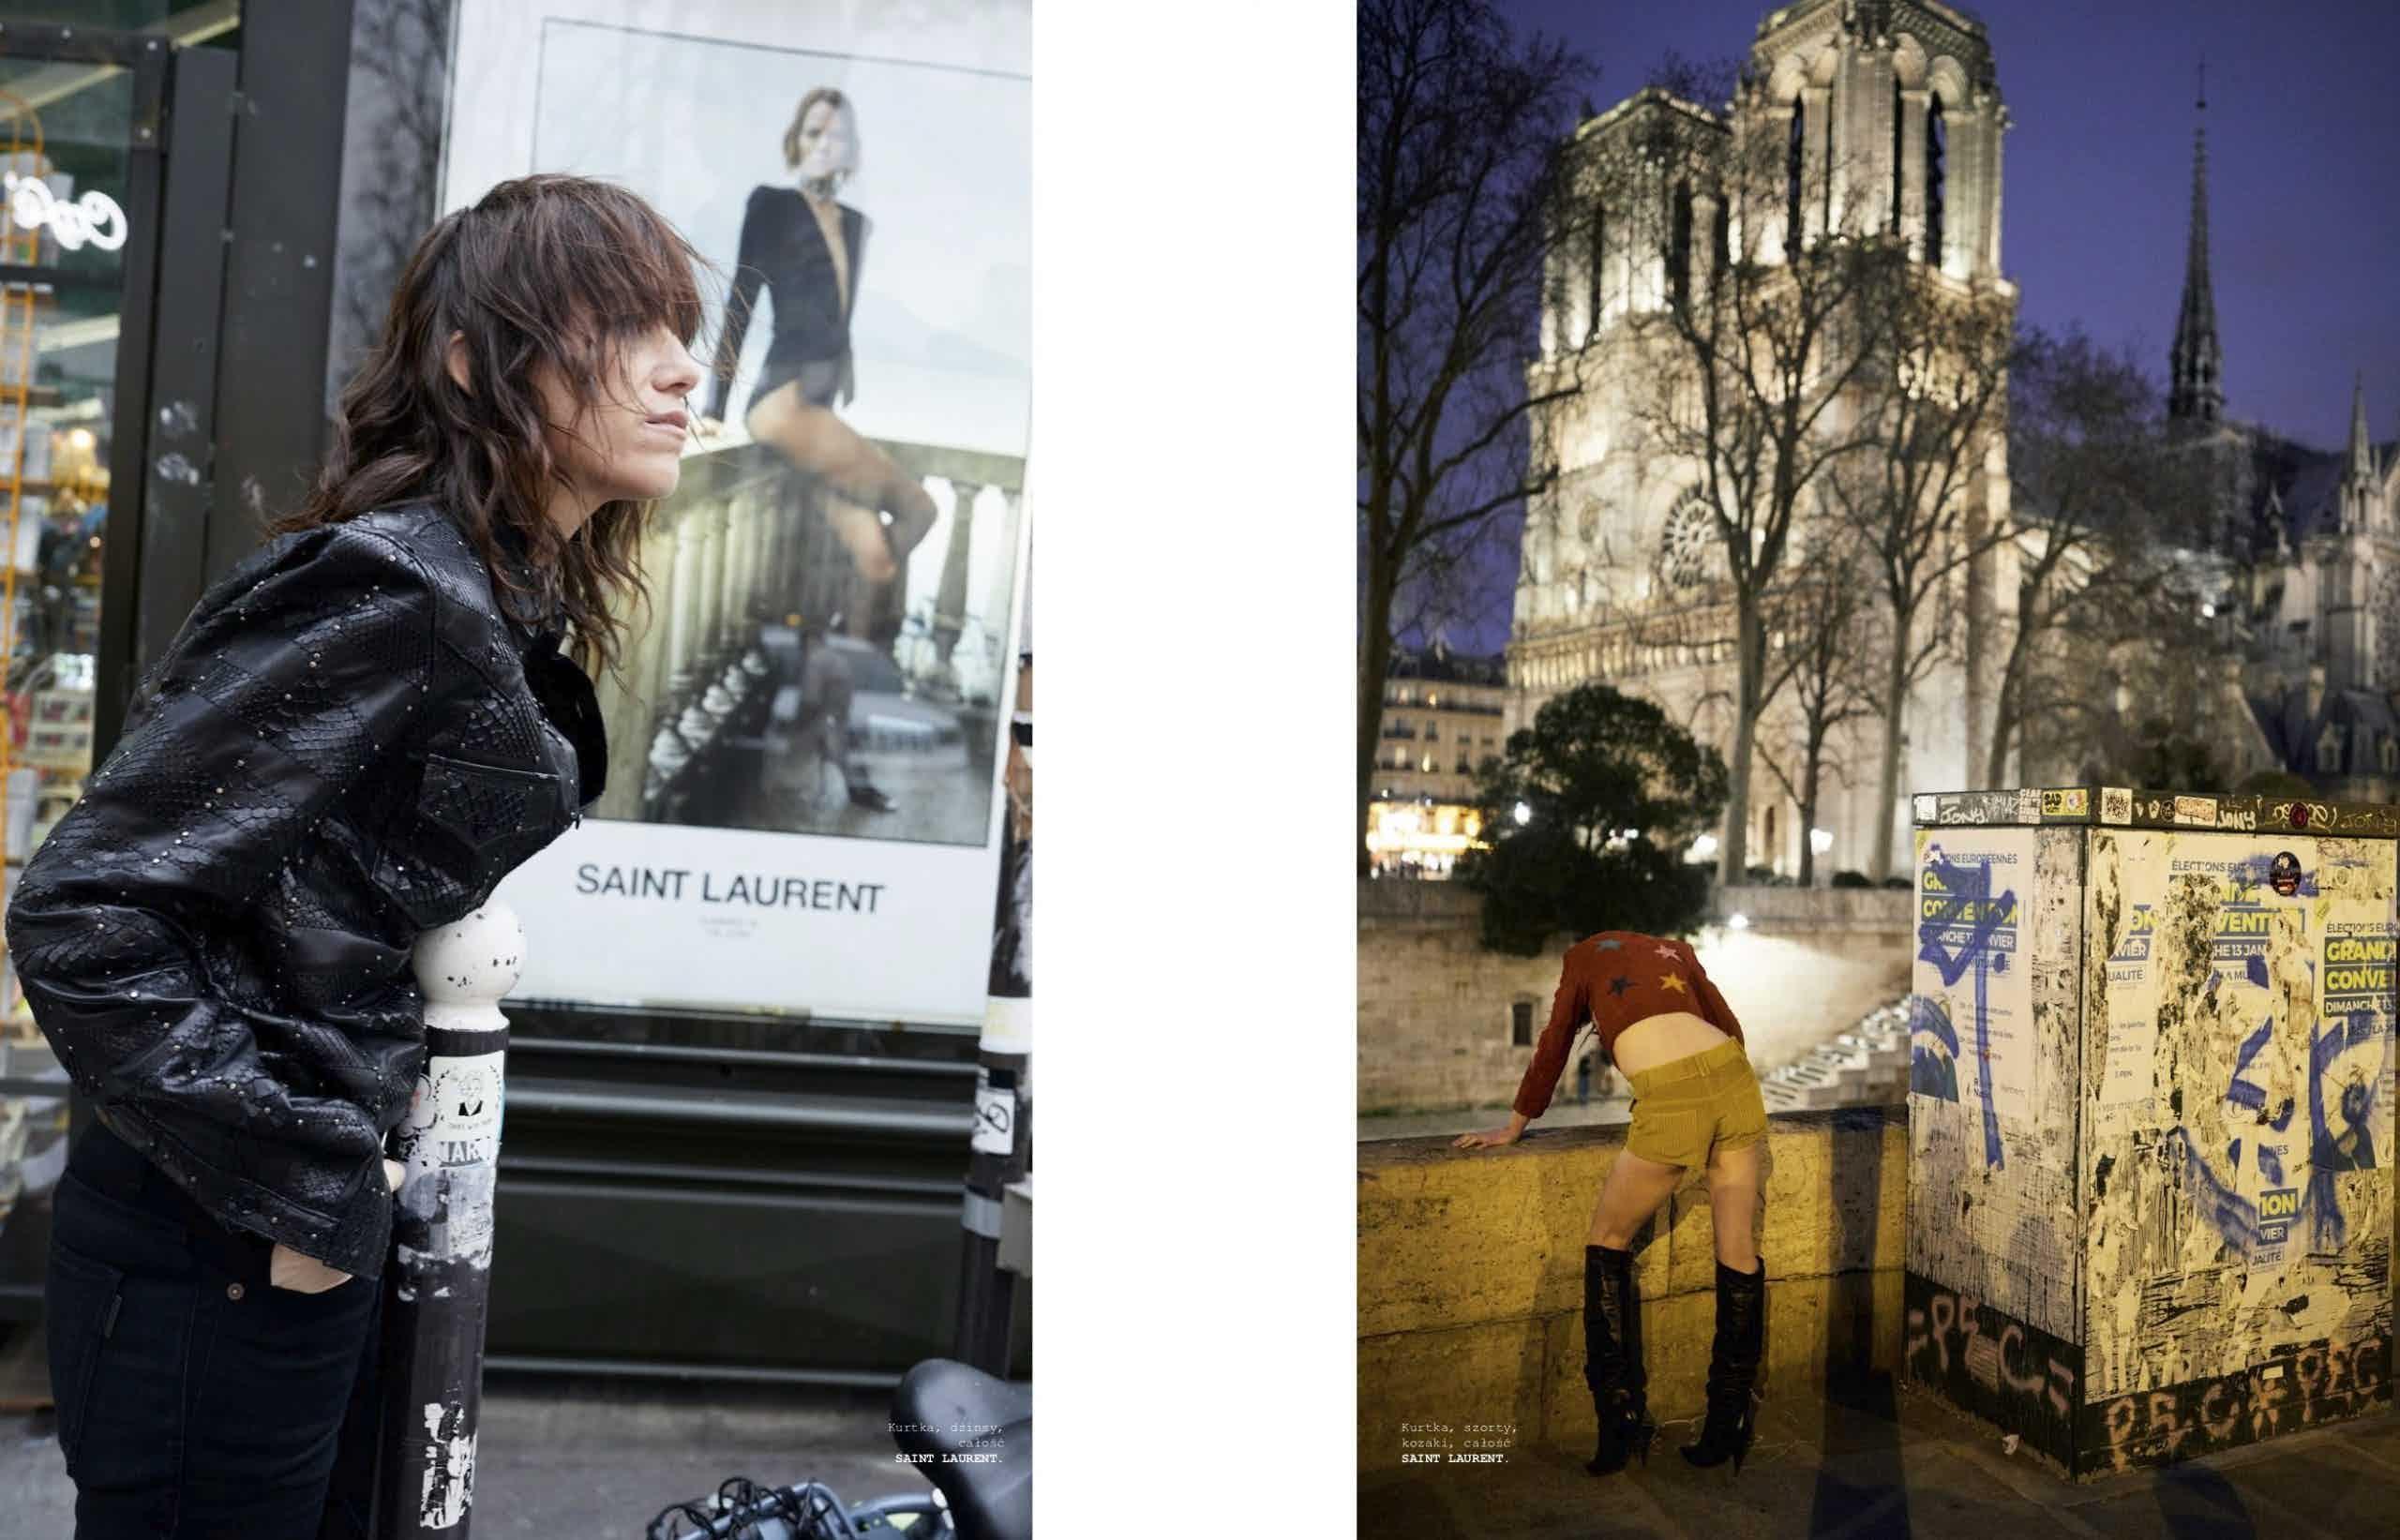 VOGUE POLAND - May 2019 Photographer: Juergen Teller Model: Charlotte Gainsbourg Location: Paris